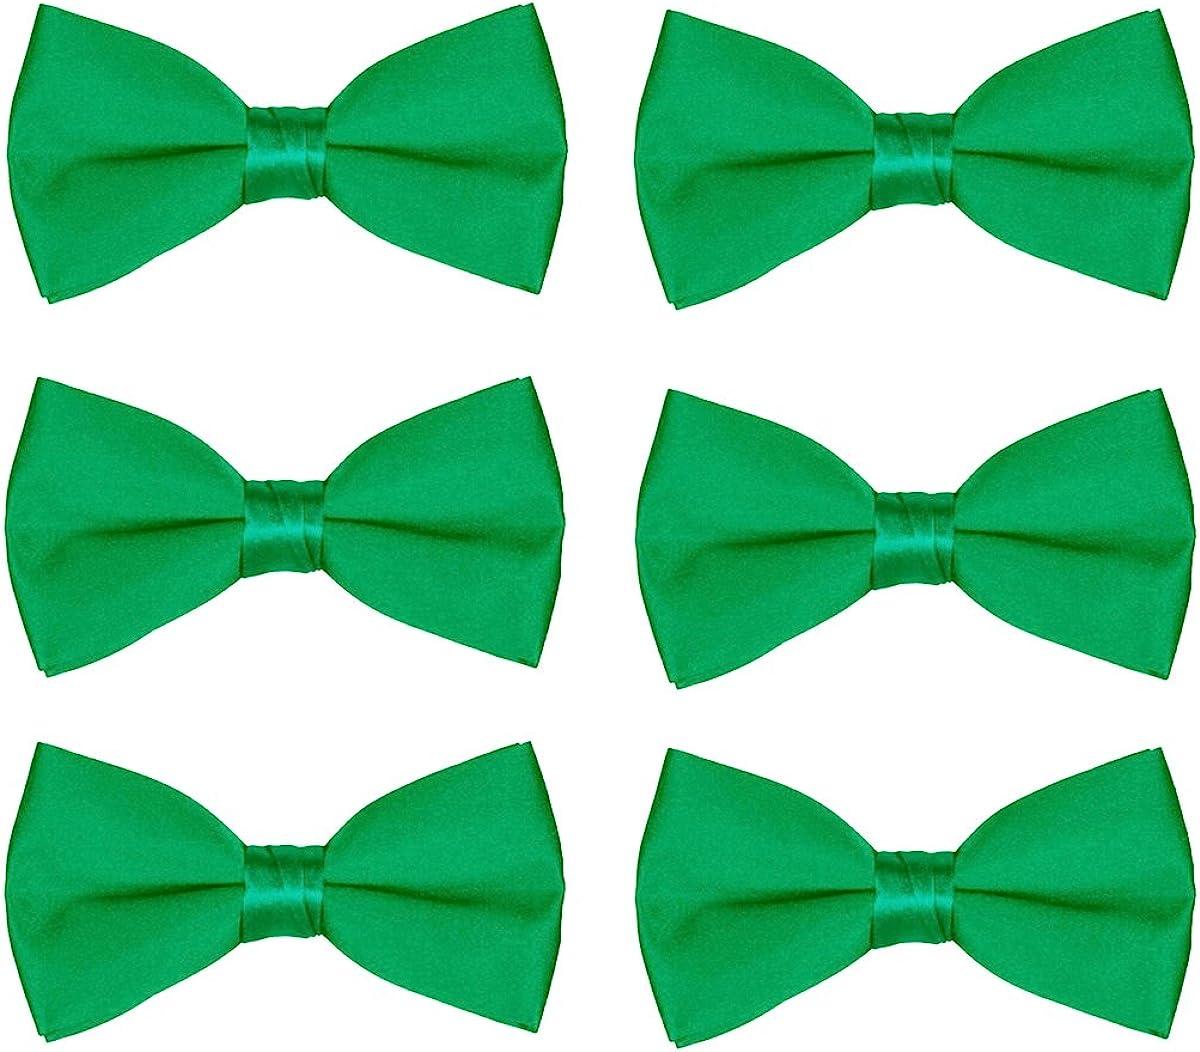 Men's Bow Tie Wholesale 6 Pack Wedding Ties Pre-Tied Formal Tuxedo Bowties